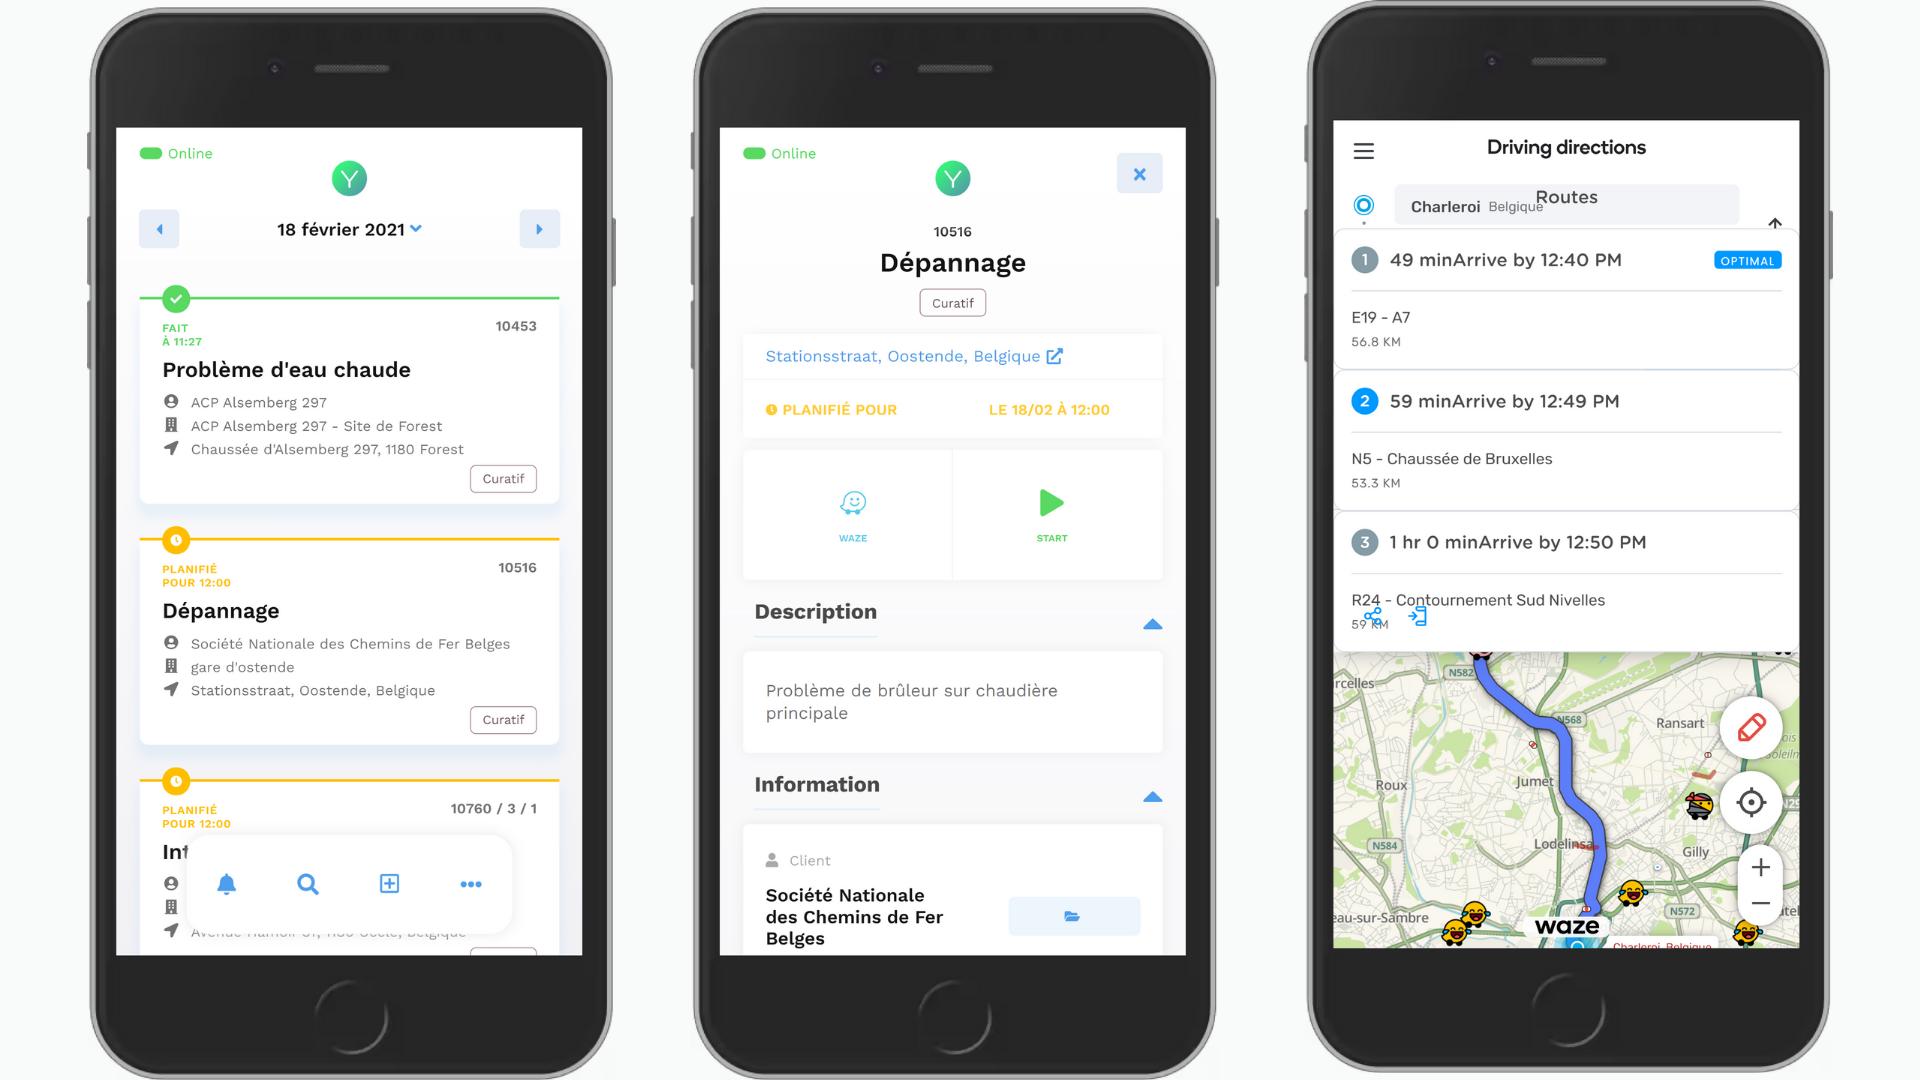 Yuman CMMS card - management software Technician interventions - Waze GPS vehicle geolocation